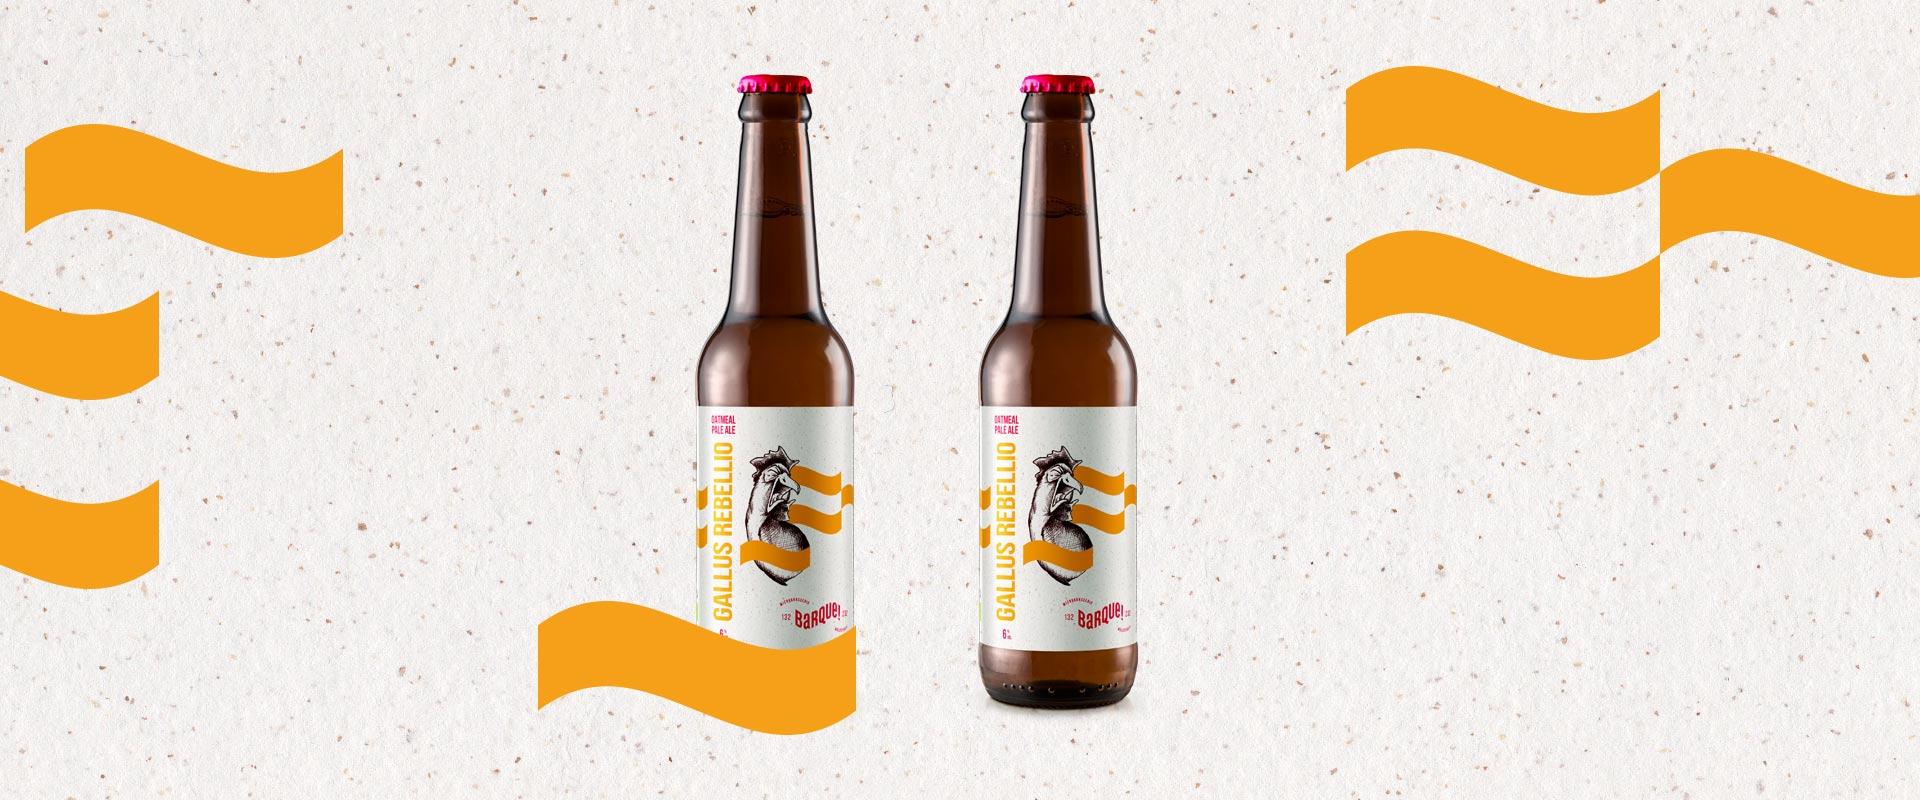 Bière artisanale bretonne